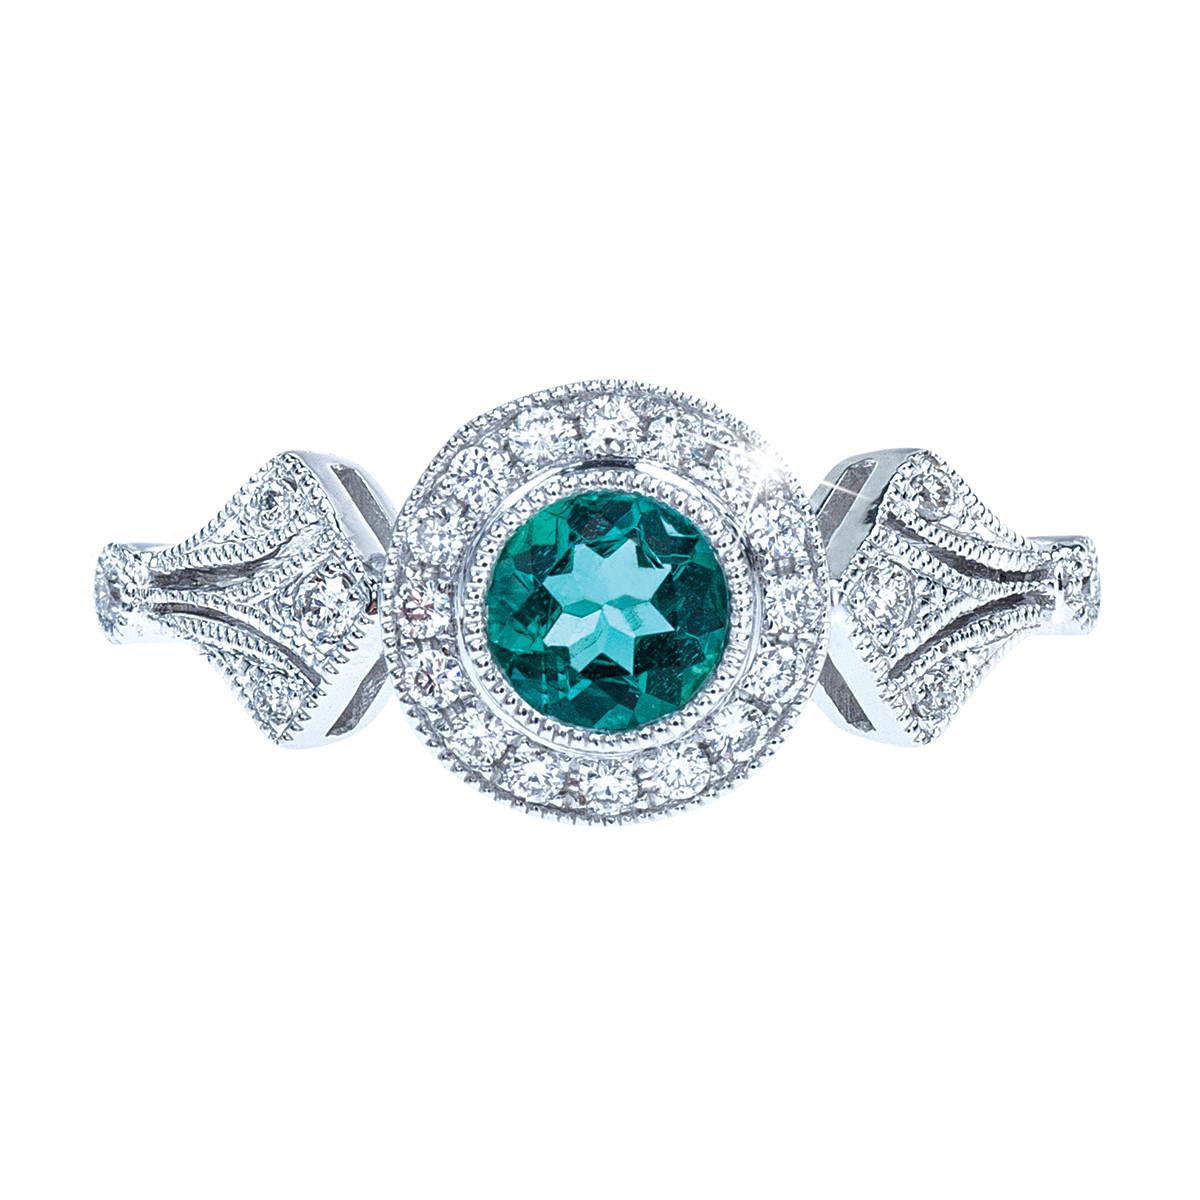 New 0.27 CT Emerald & Diamond Halo Ring